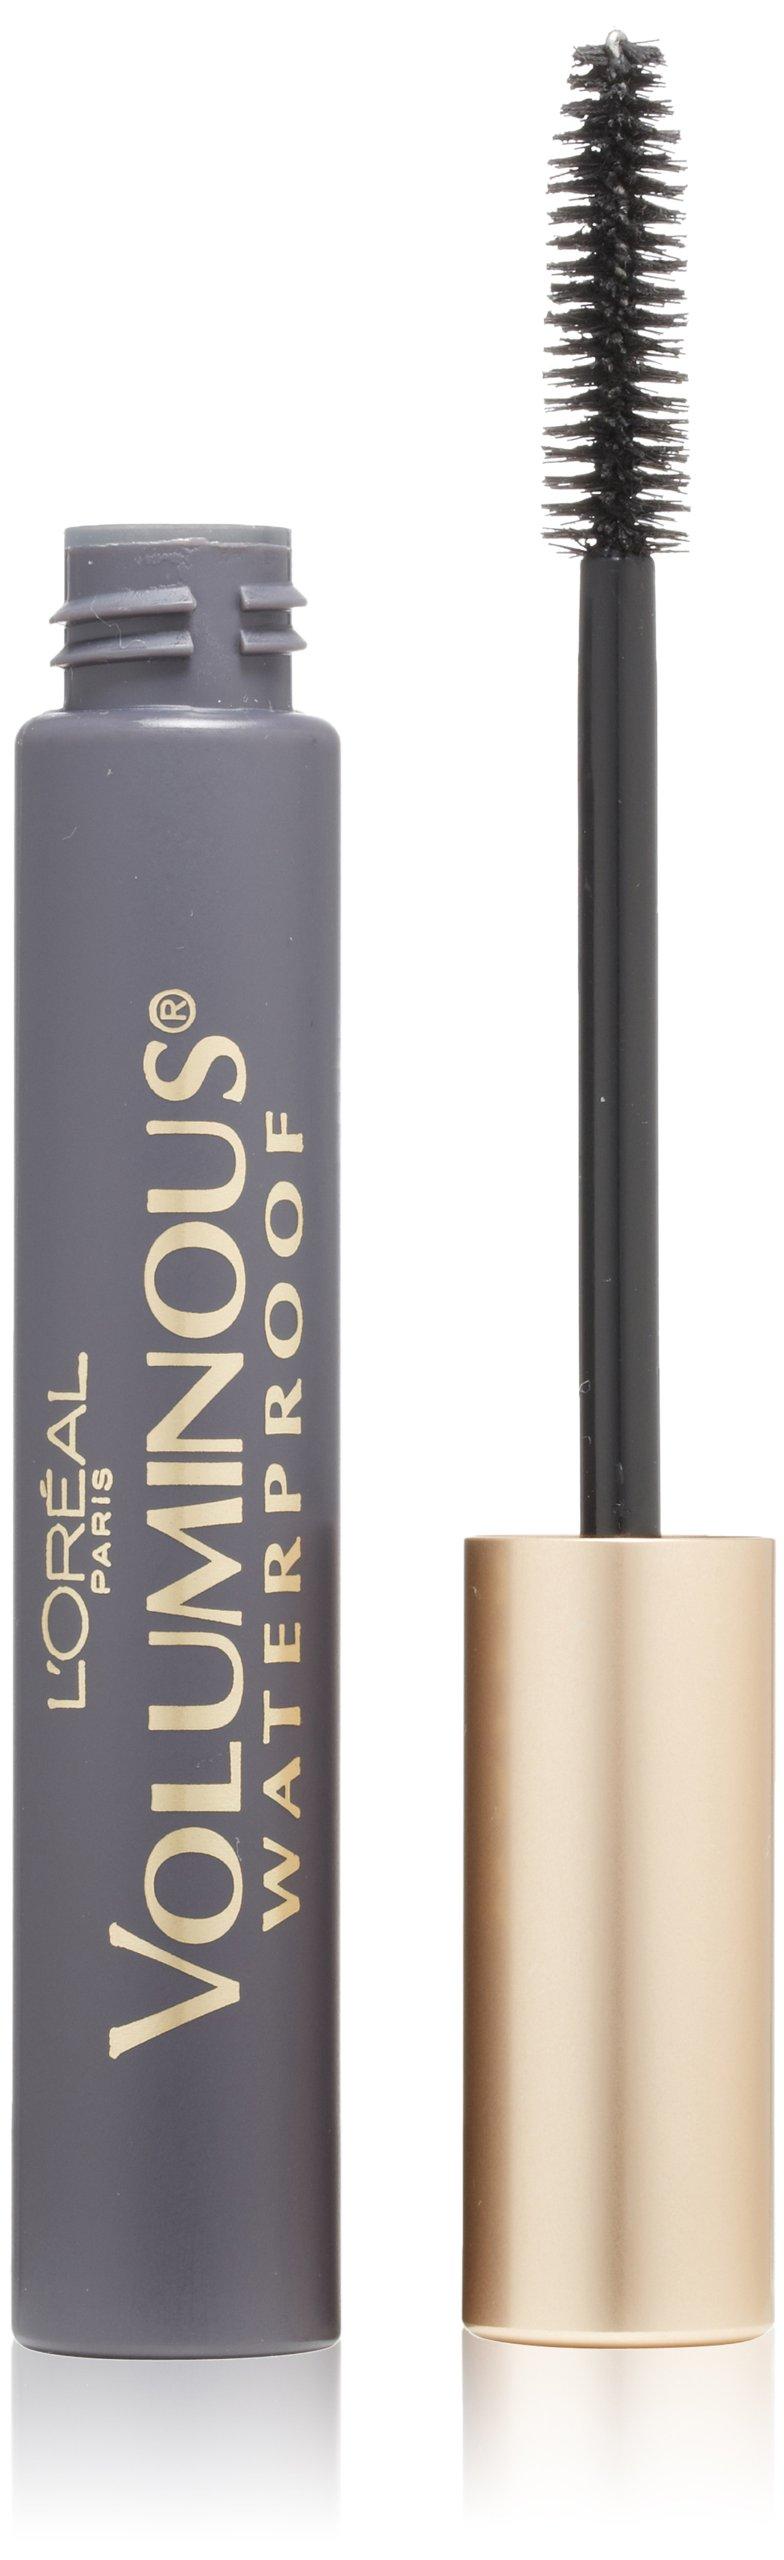 L'Oréal Paris Voluminous Volume Building  Waterproof Mascara, Black, 0.28 fl. oz.